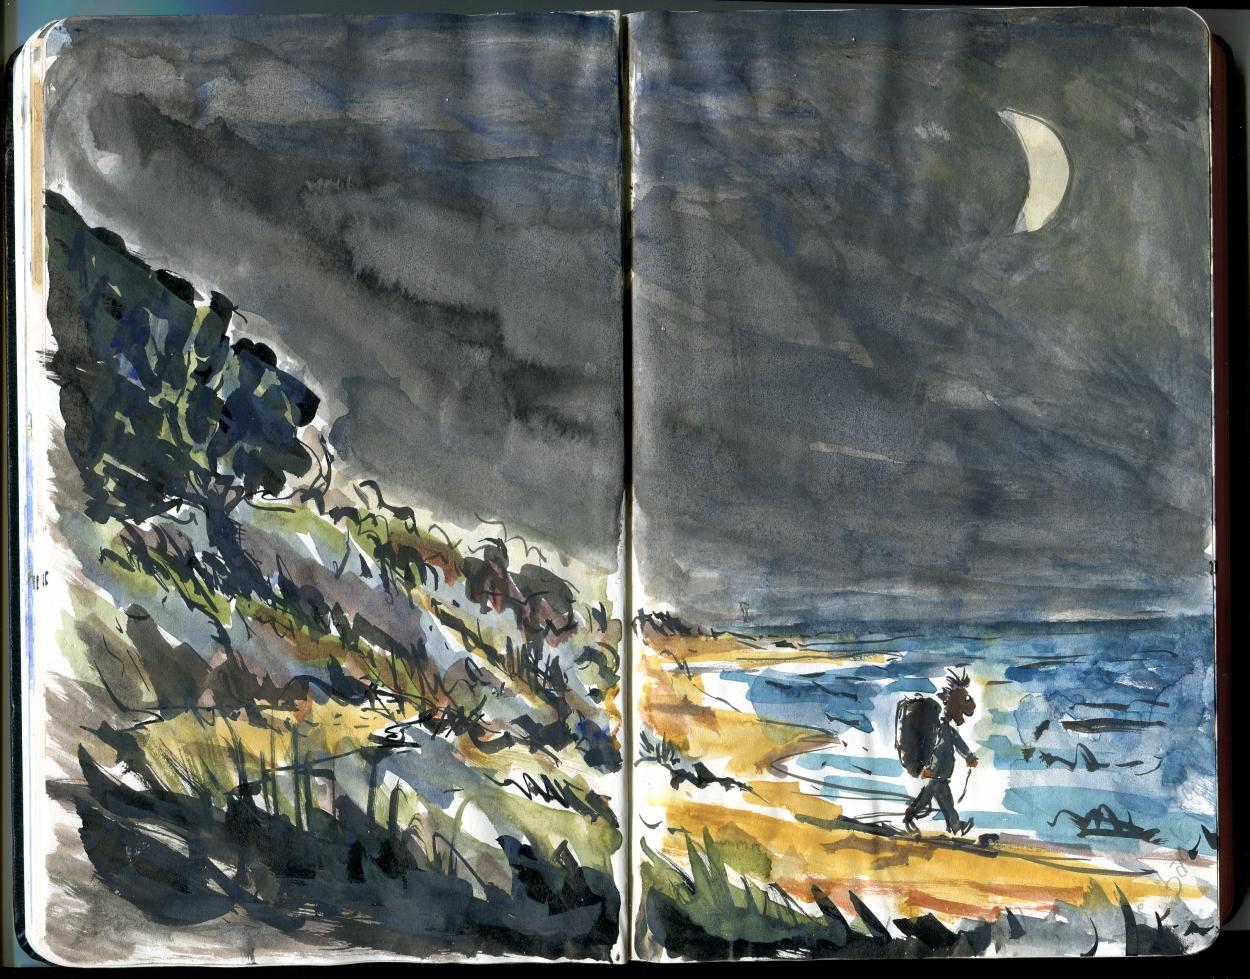 Hiking at night - Moleskine Hiking Sketch from Bornholm